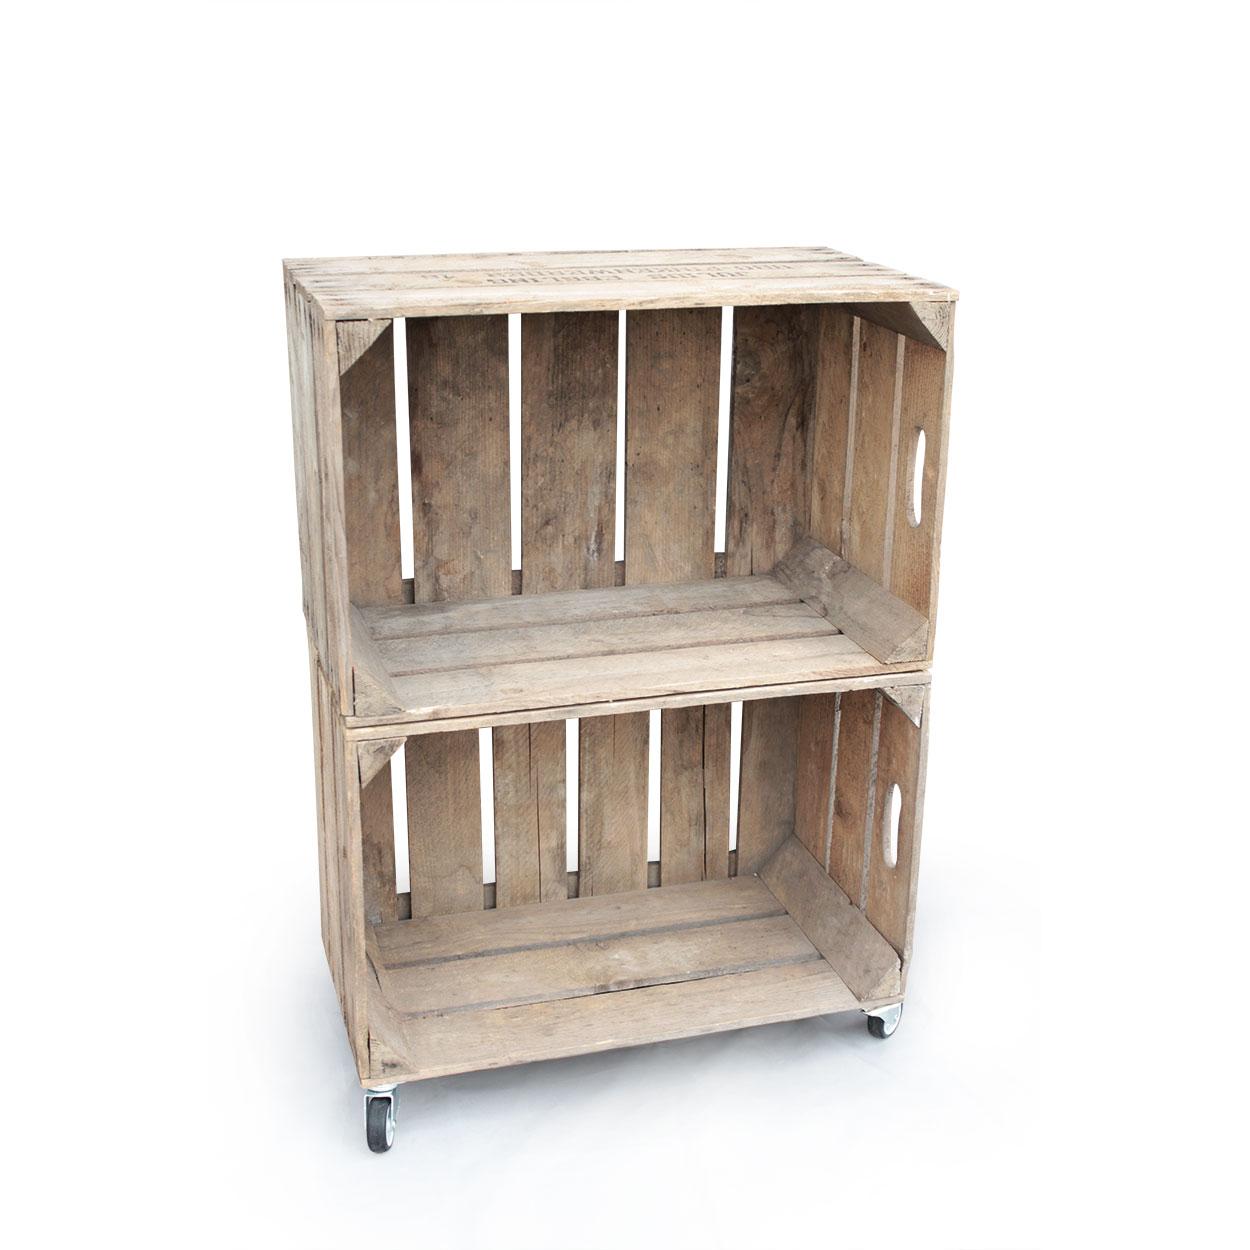 m bel regal moritz 75x54x32cm. Black Bedroom Furniture Sets. Home Design Ideas